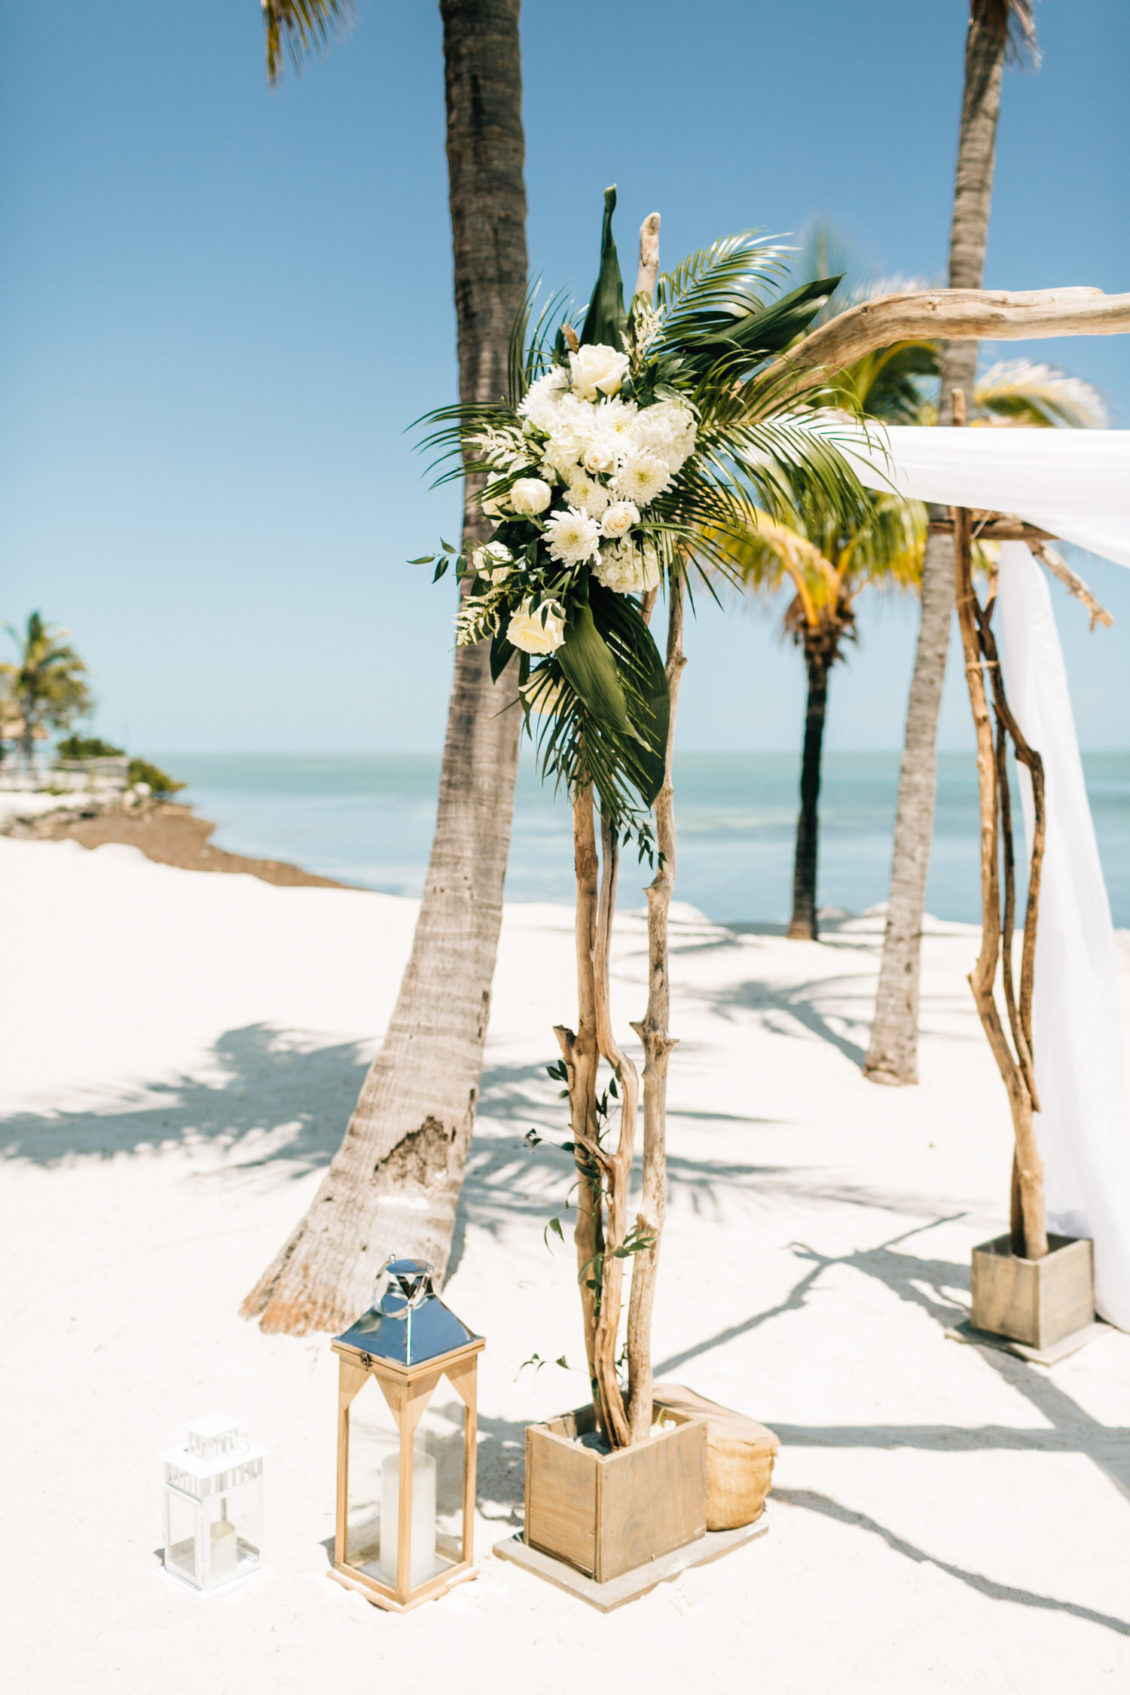 finding_light_photography-postcard_inn_holiday_isle_wedding_photography-islamorada_wedding_photographer-010-1130x1695.jpg